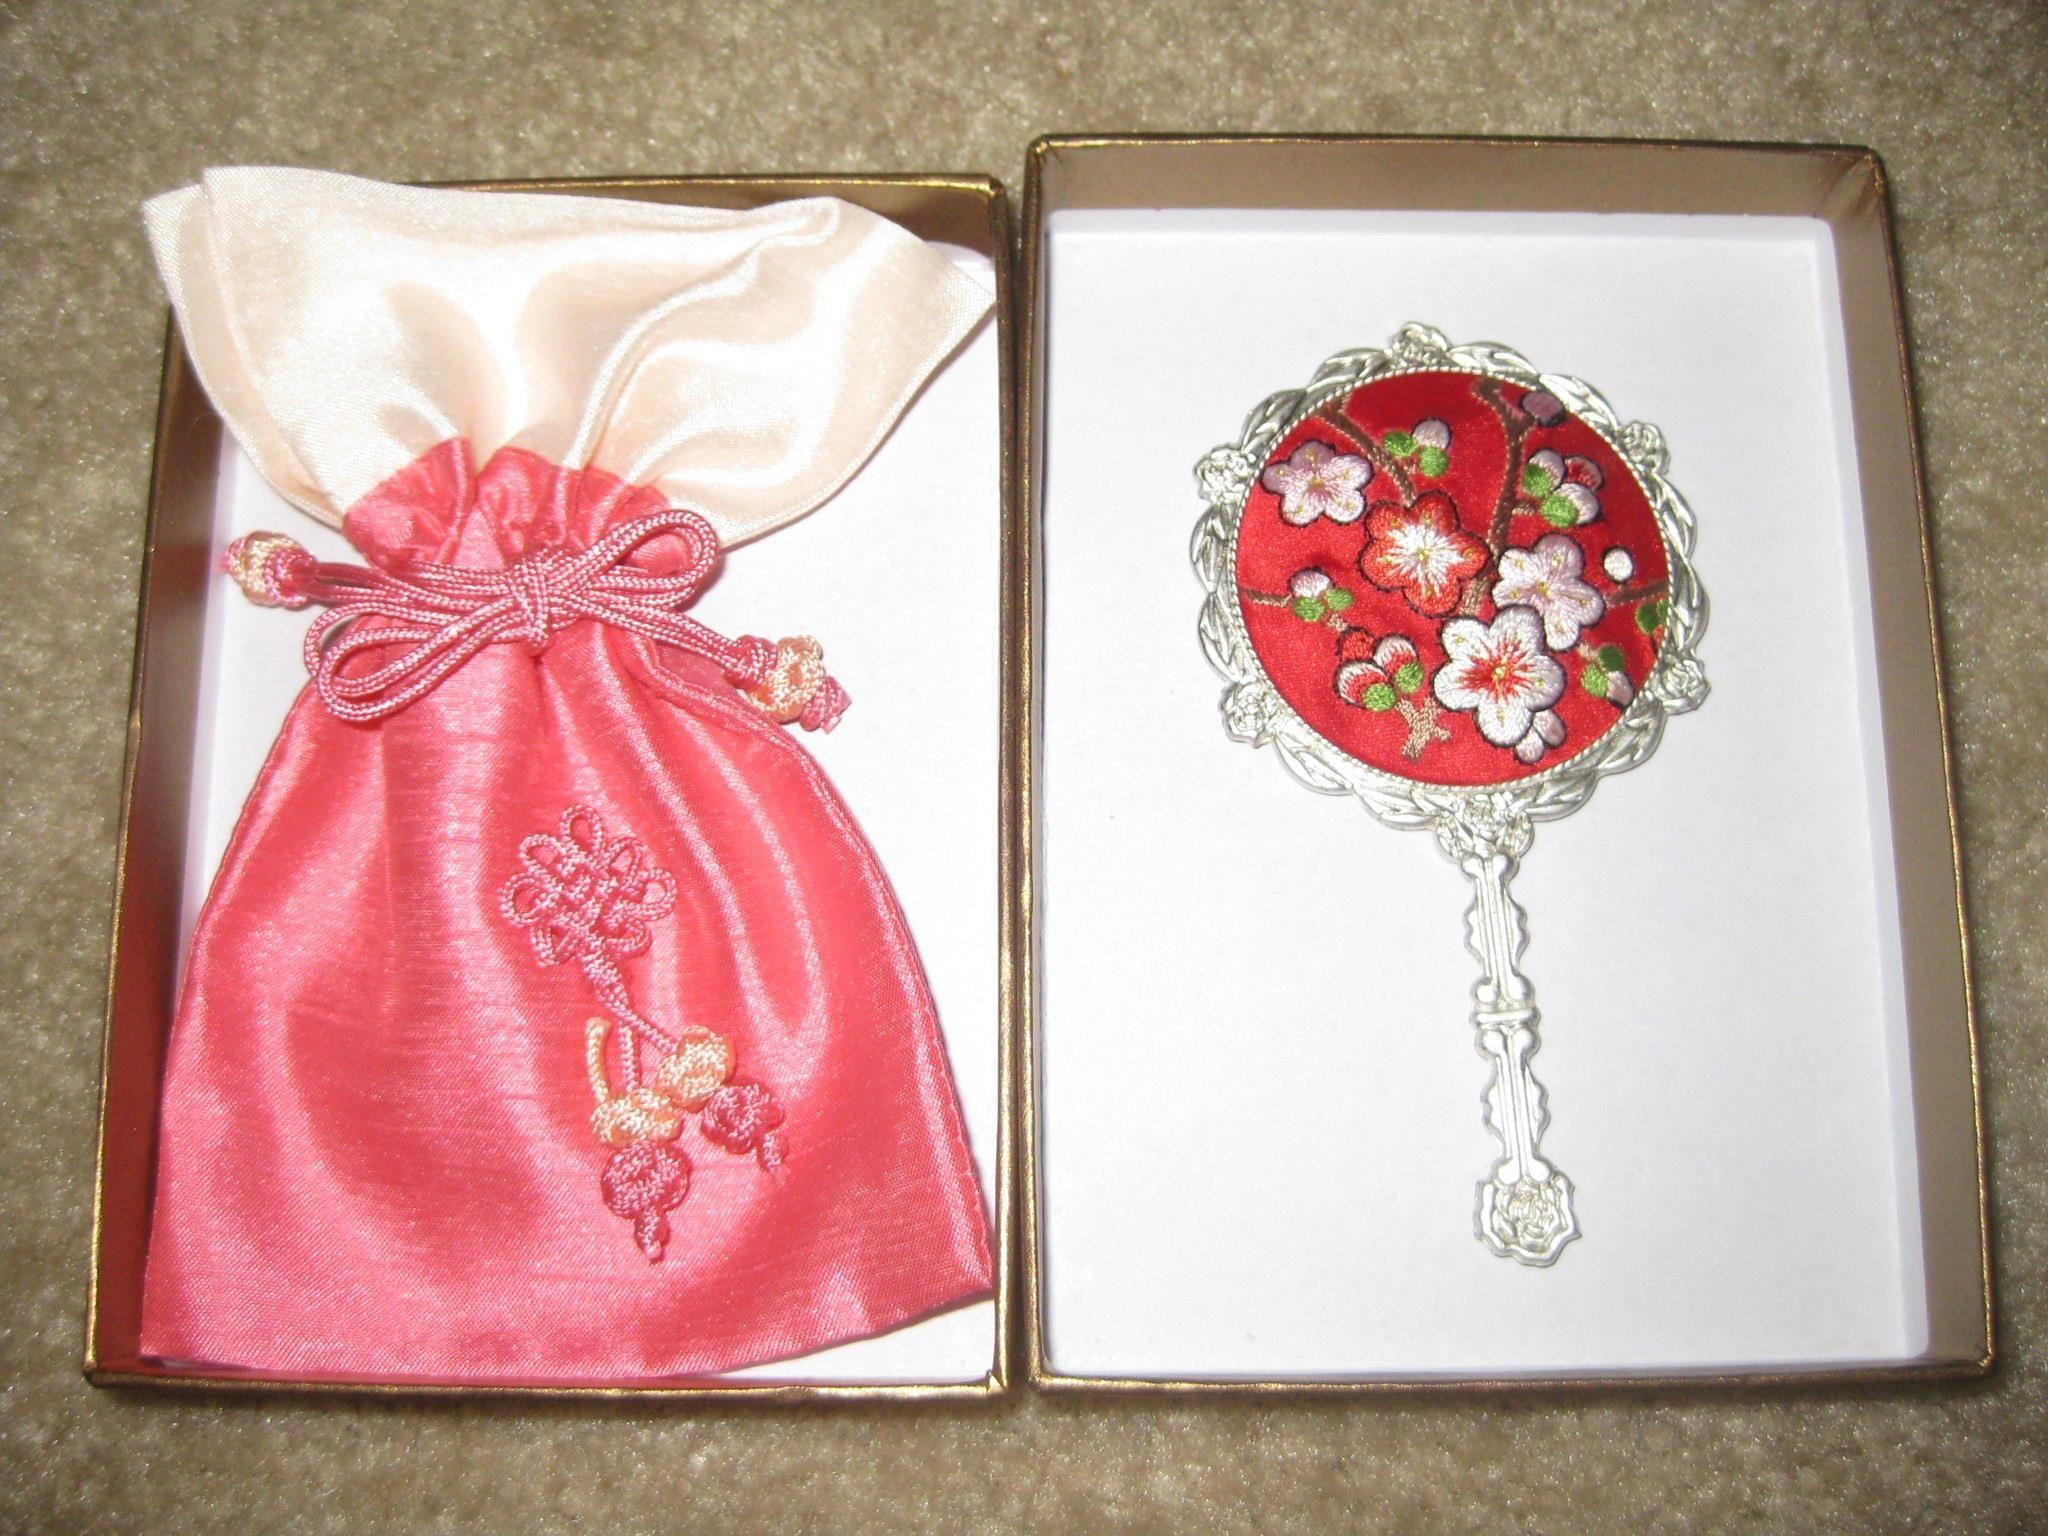 A Korean mirror and bag, a prize I received from the Korea Tourism ...